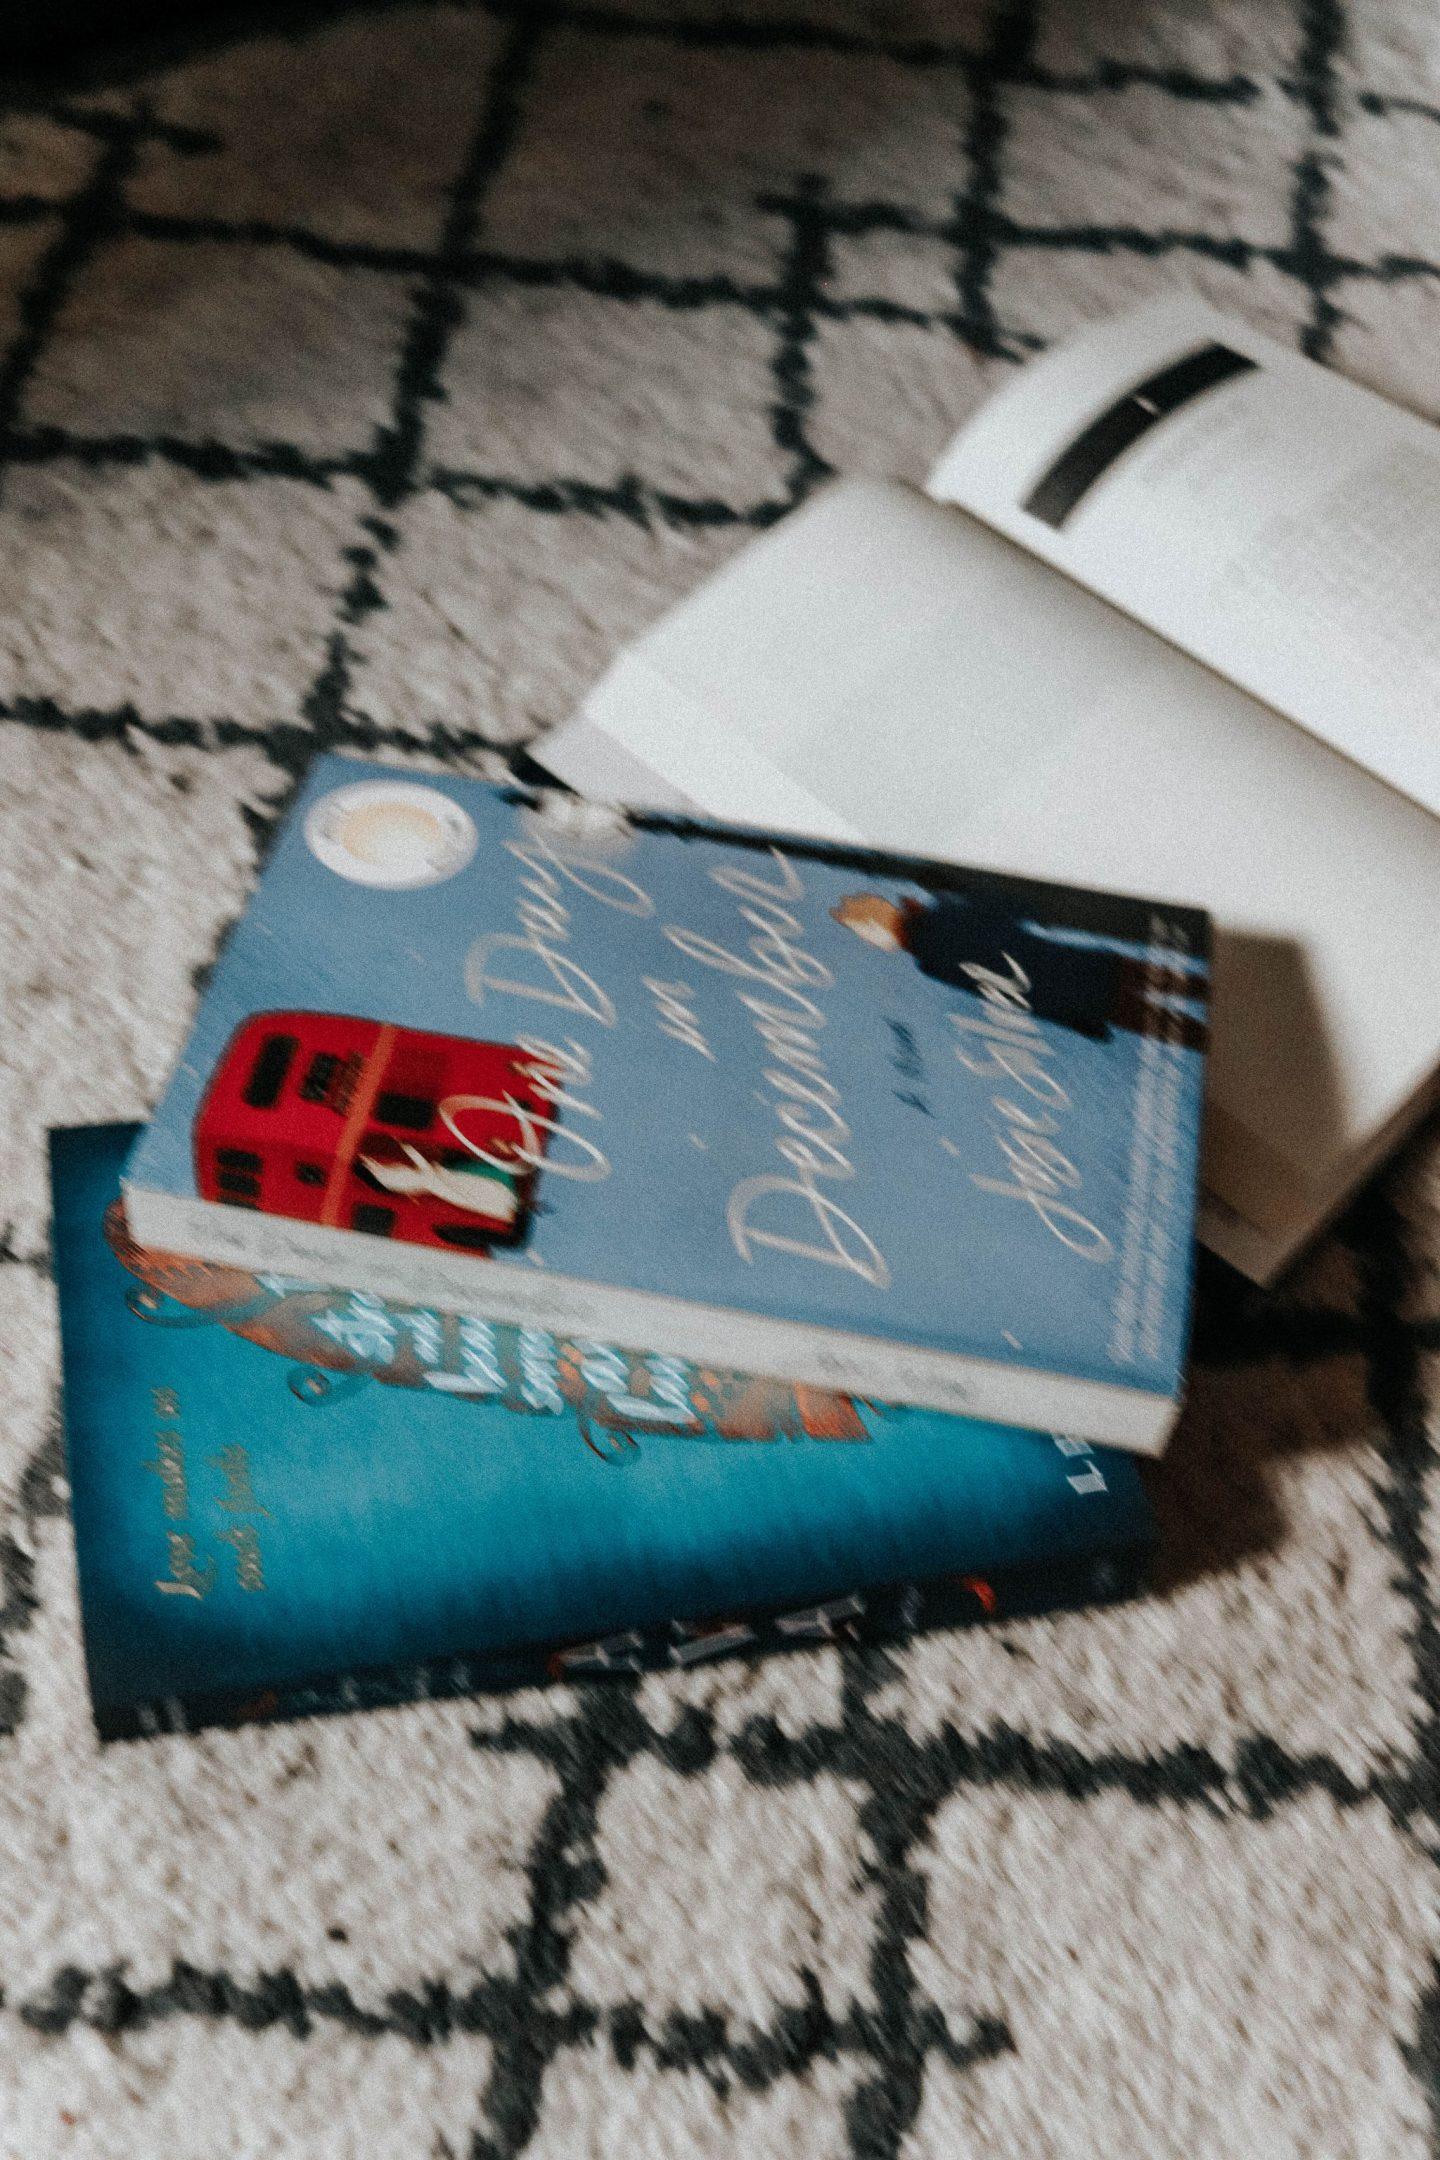 reading-books-12